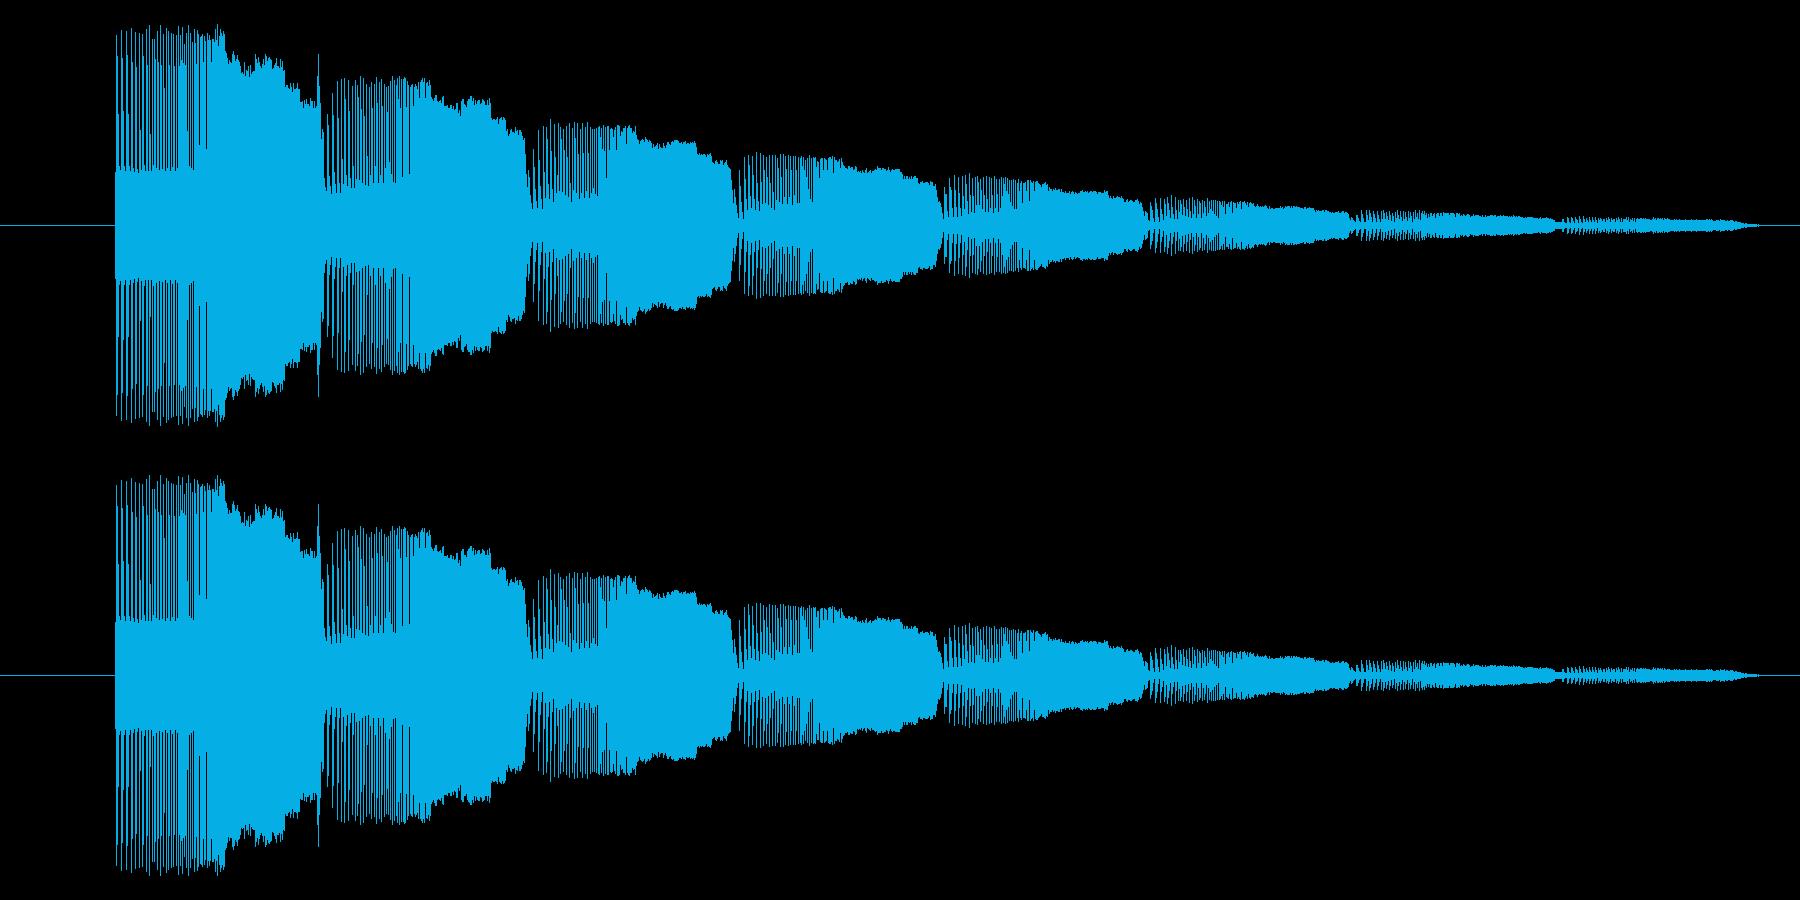 GB シューティング01-09(アイテムの再生済みの波形